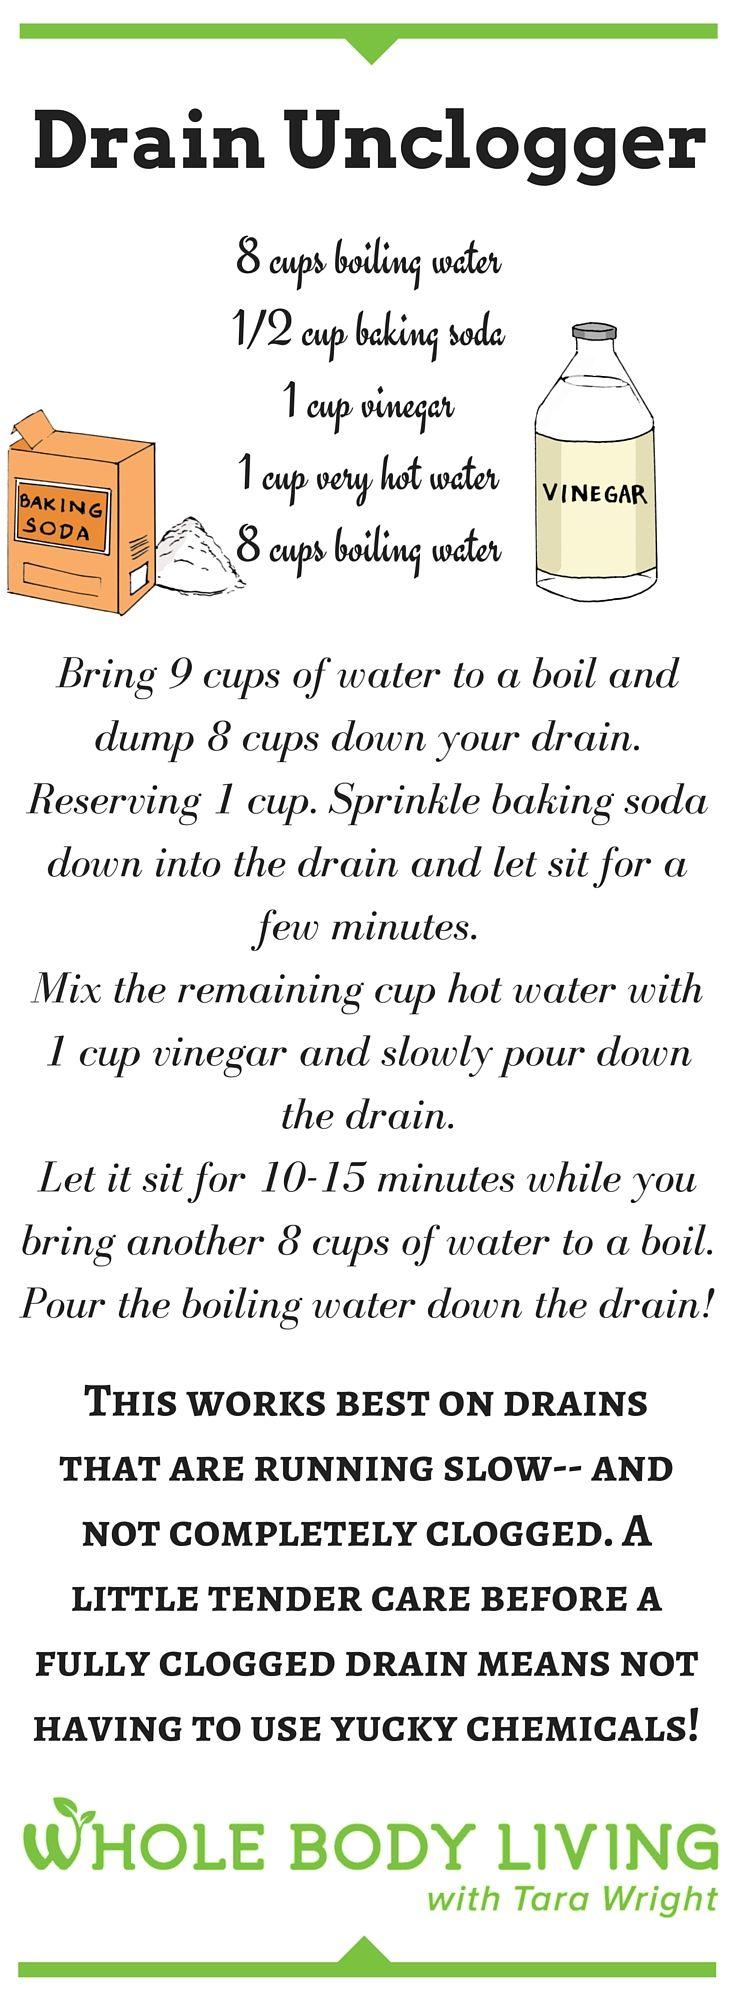 clogged description drain vinegar baking here enter soda without unclog com chemicals image bathtub unclogging